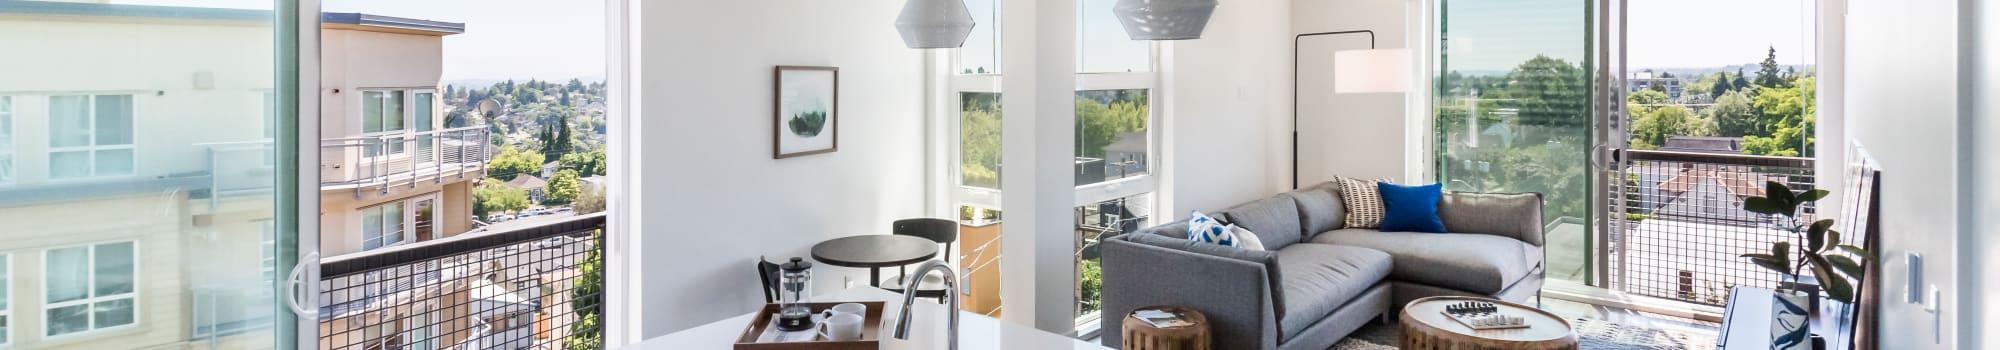 Apartments in Edmonds Washington